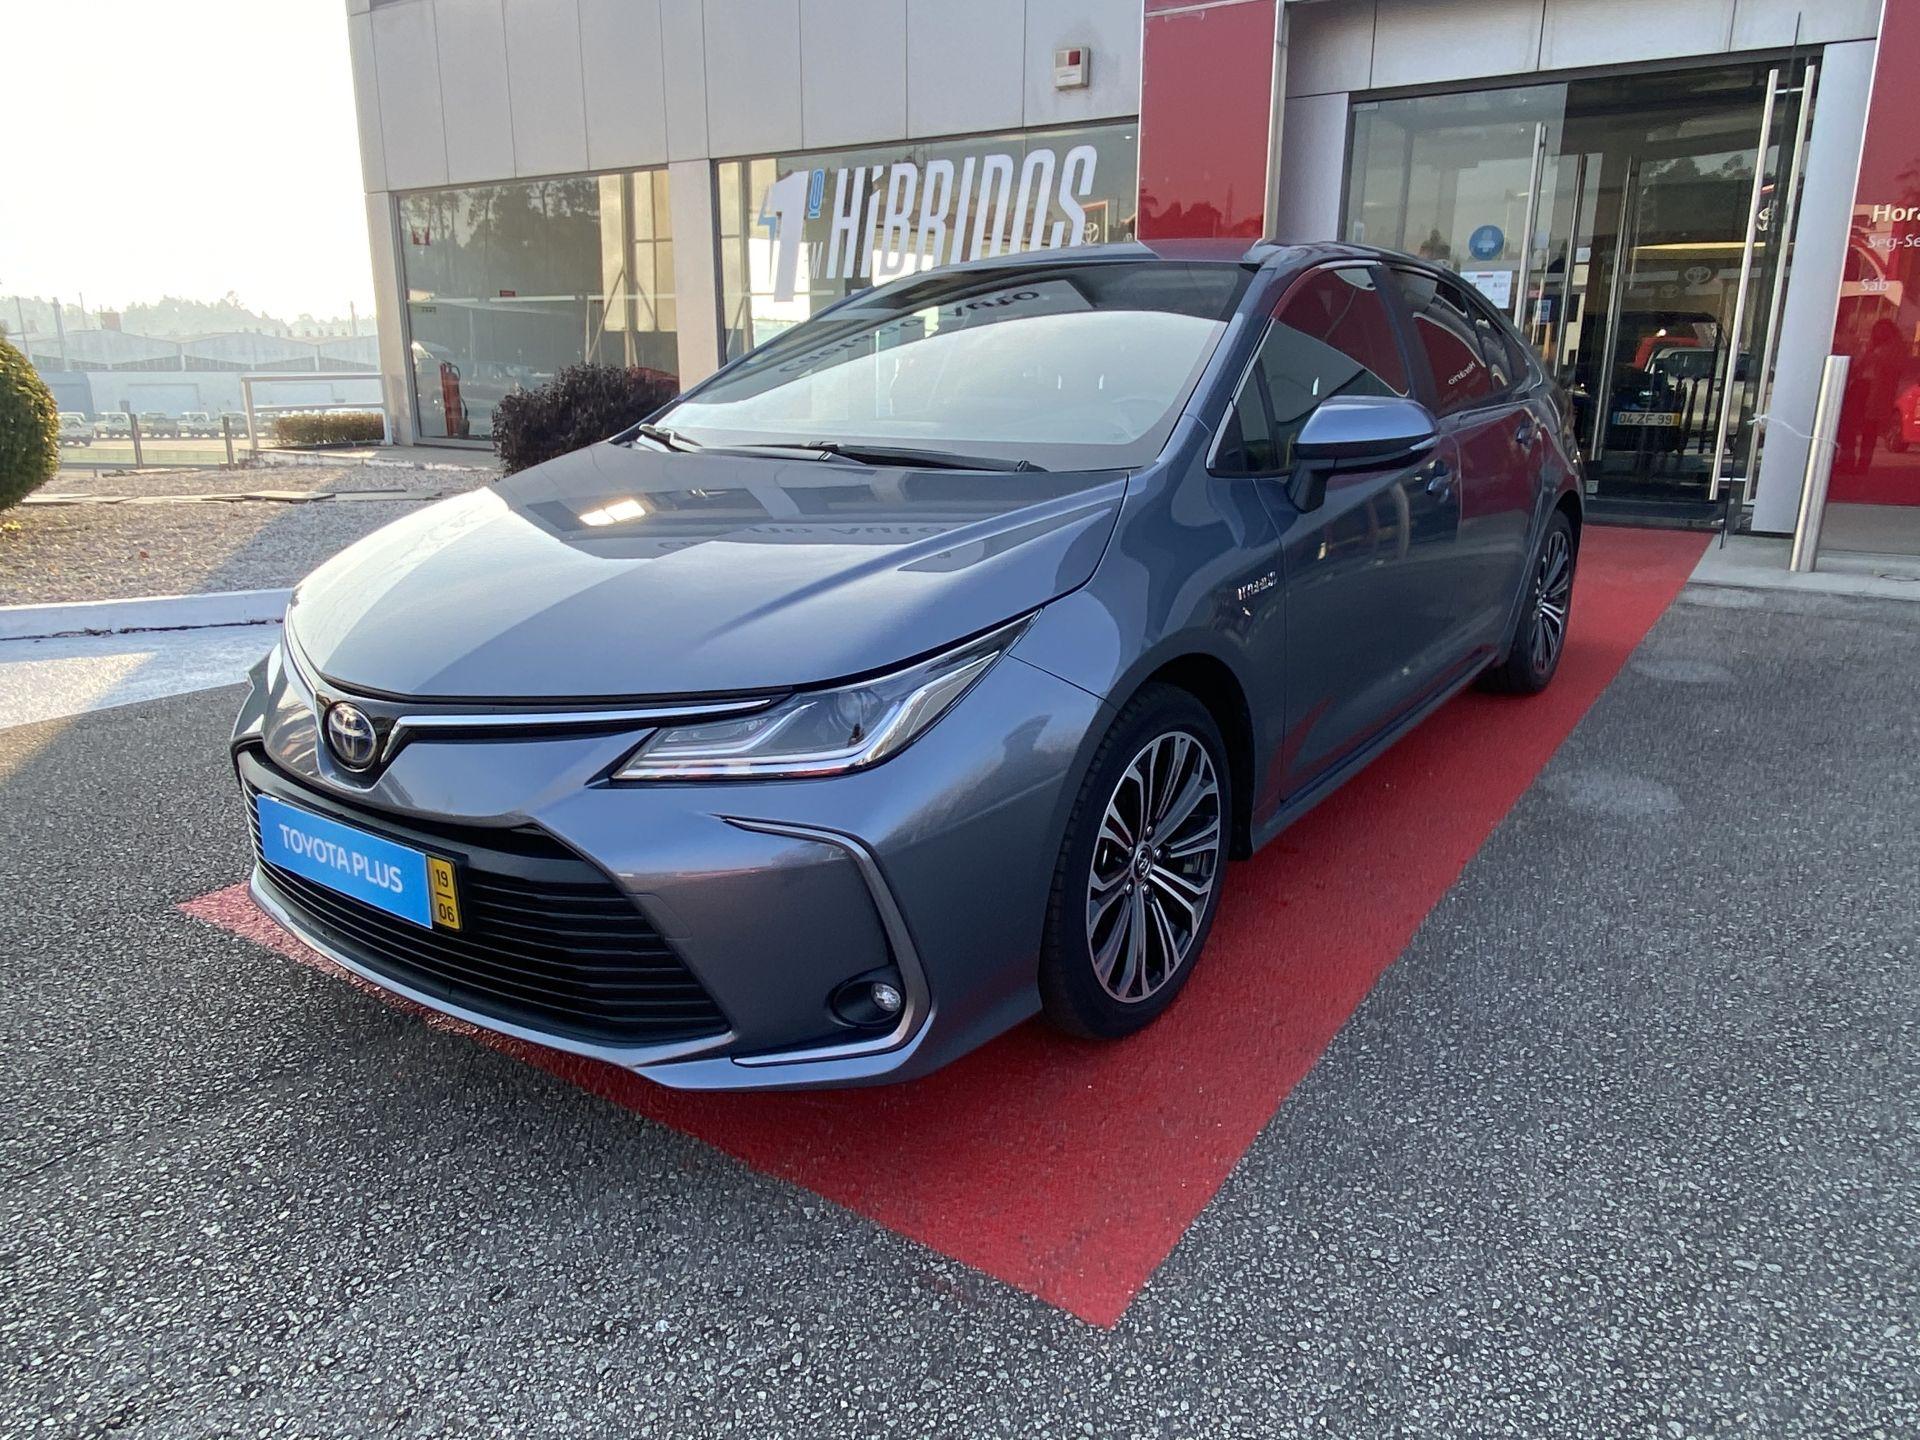 Toyota Corolla 1.8 Hybrid Exclusive usada Aveiro